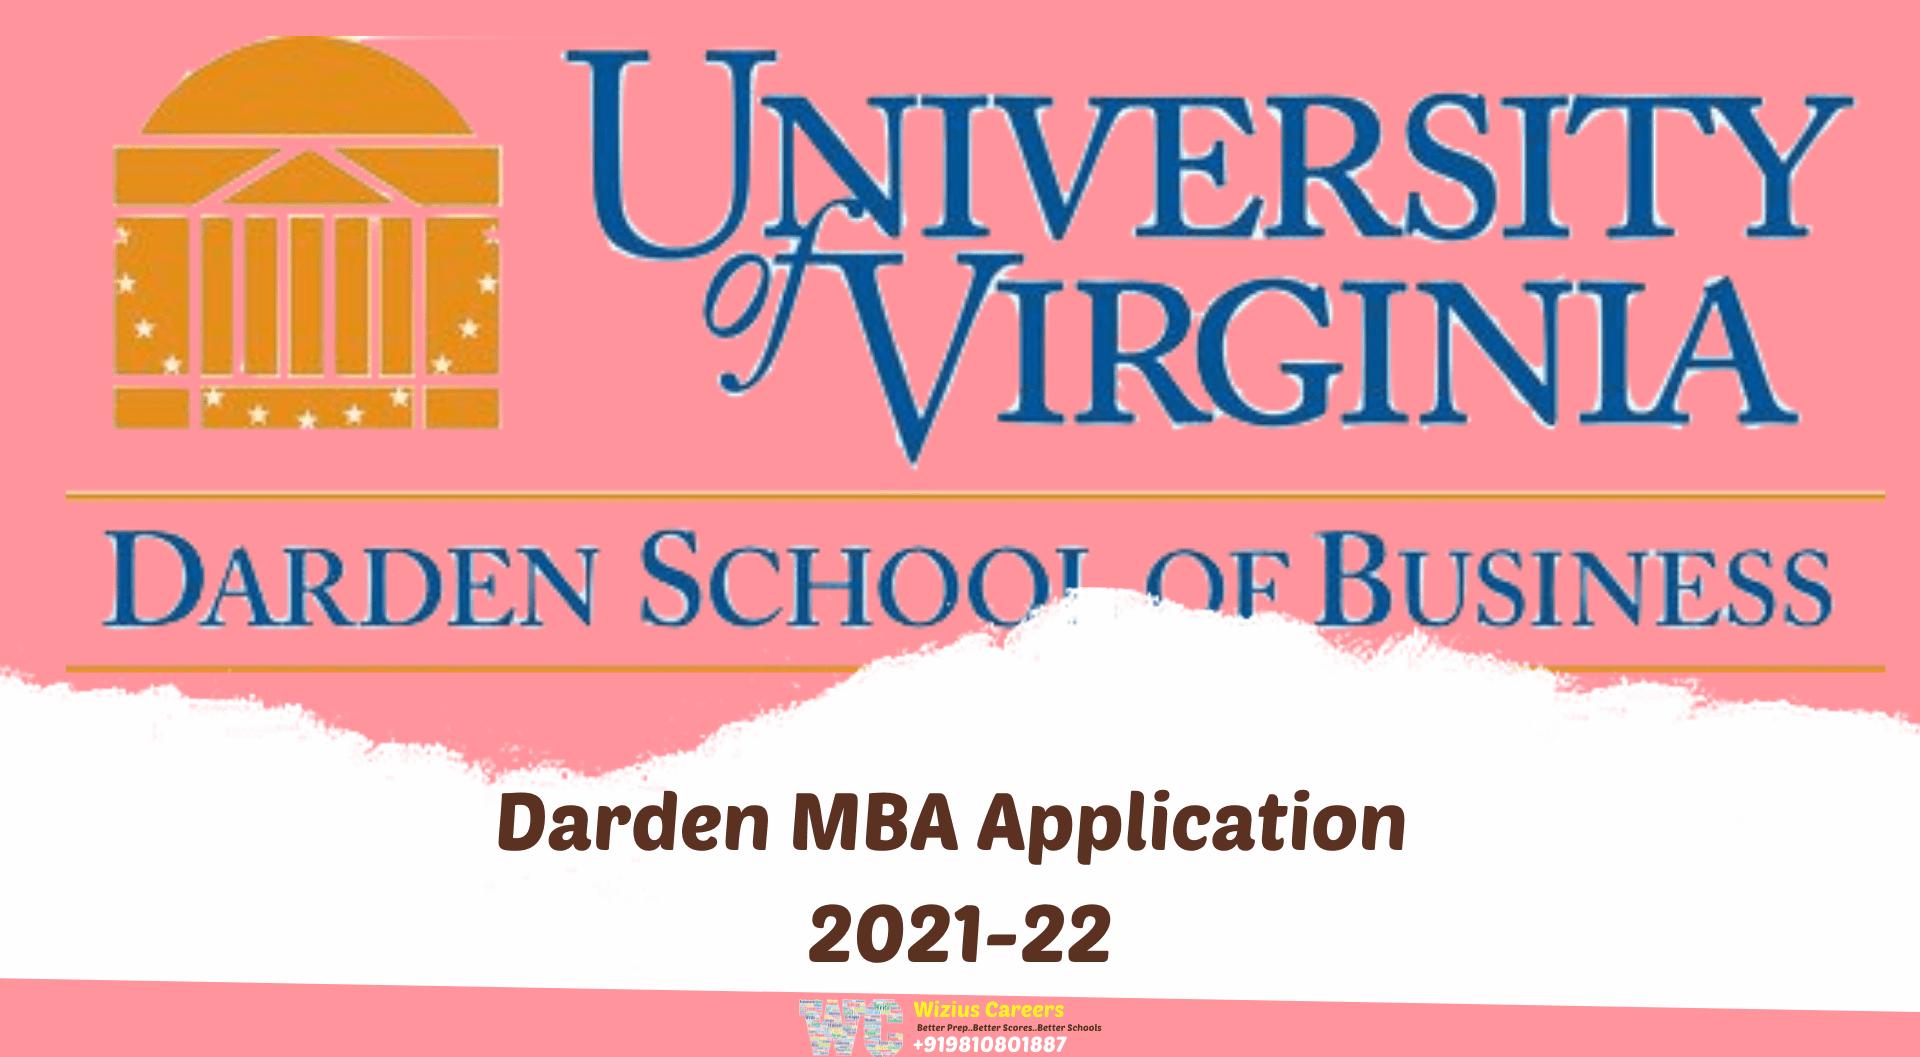 Darden MBA Application 2021-22